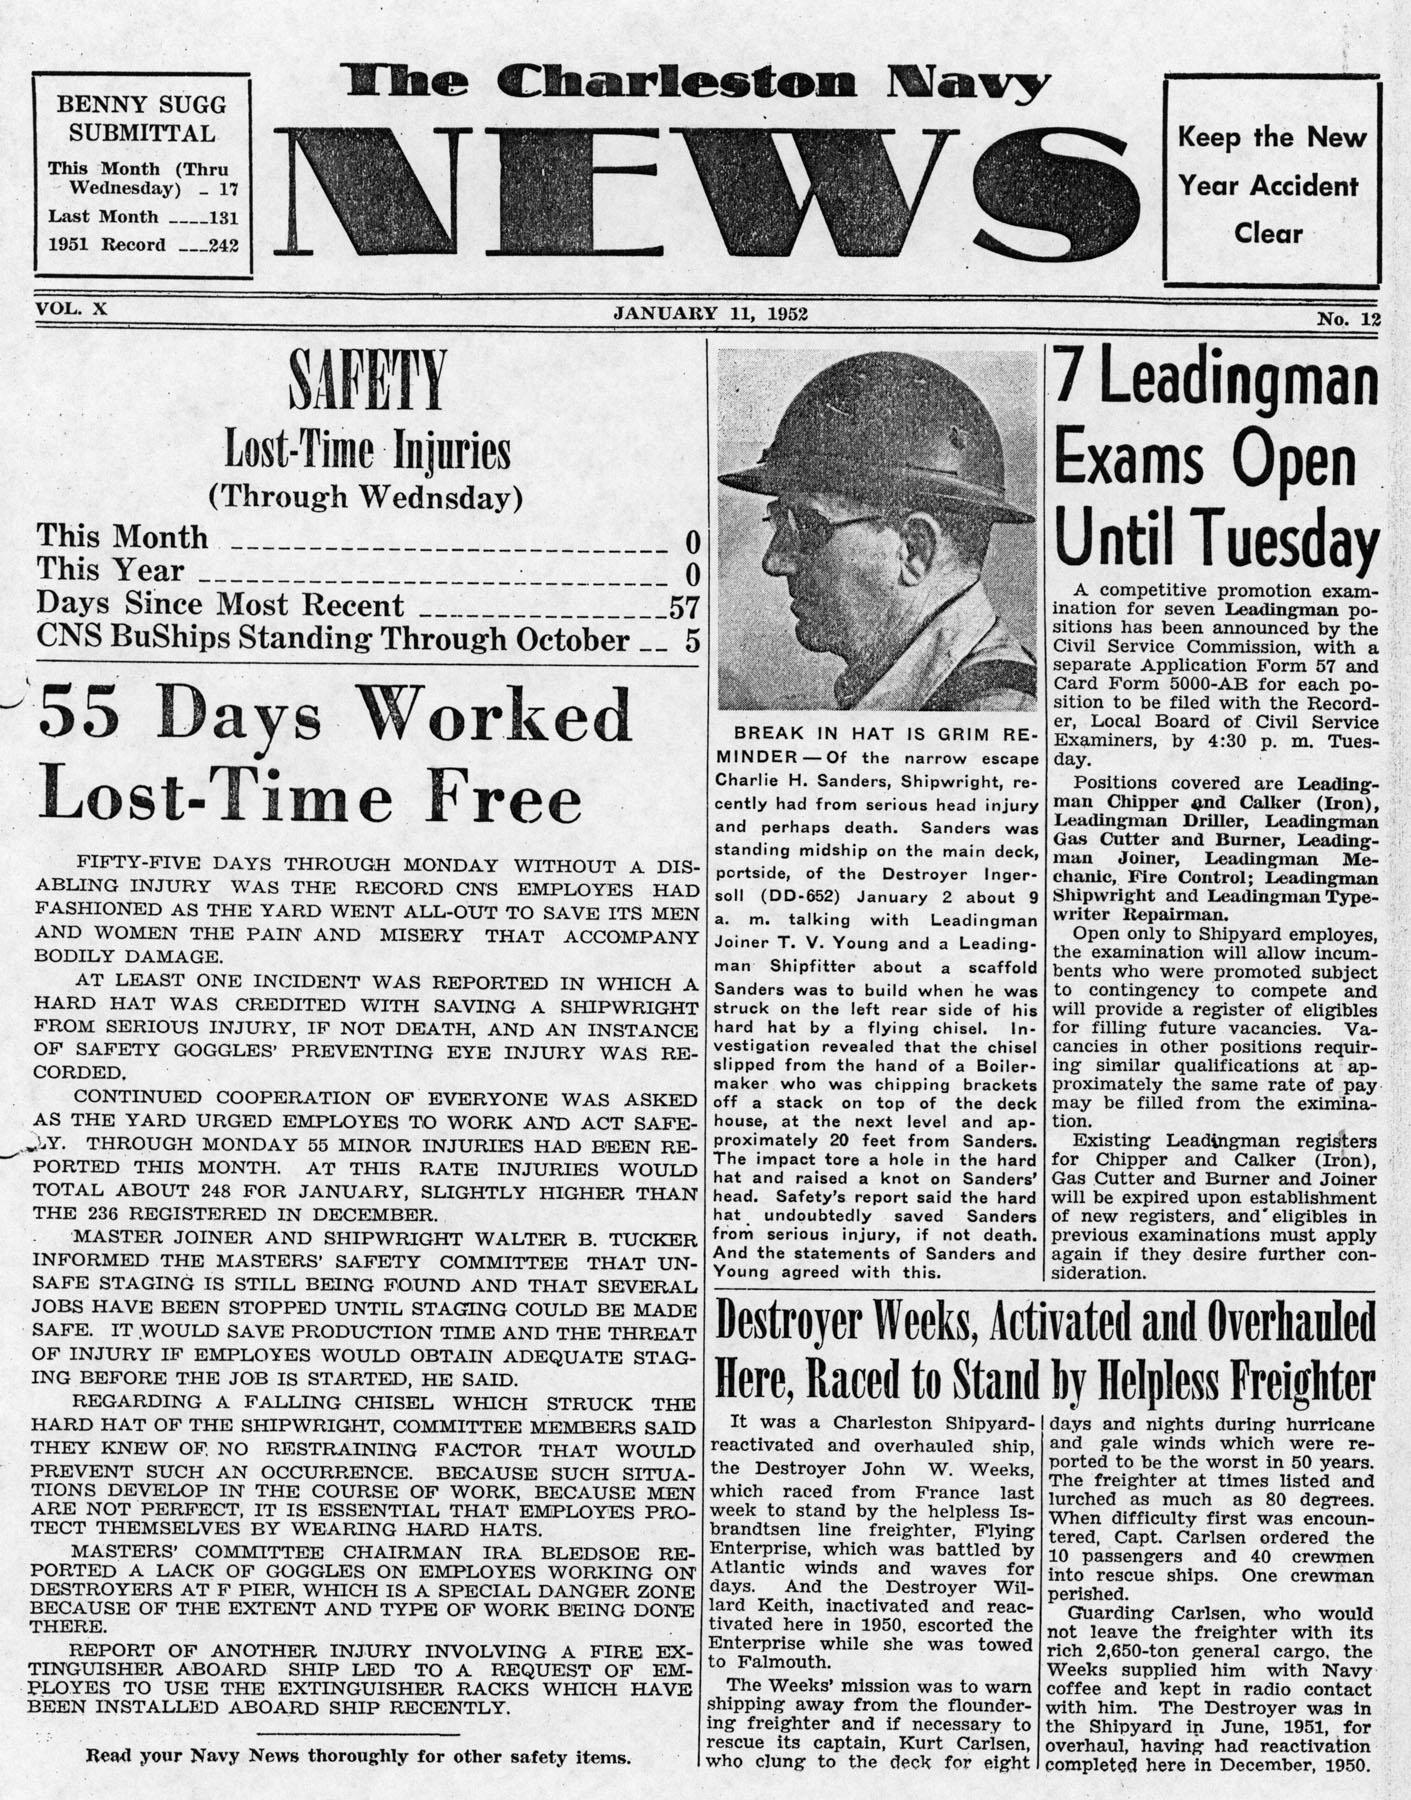 The Charleston Navy News, Volume 10, Edition 12, page i